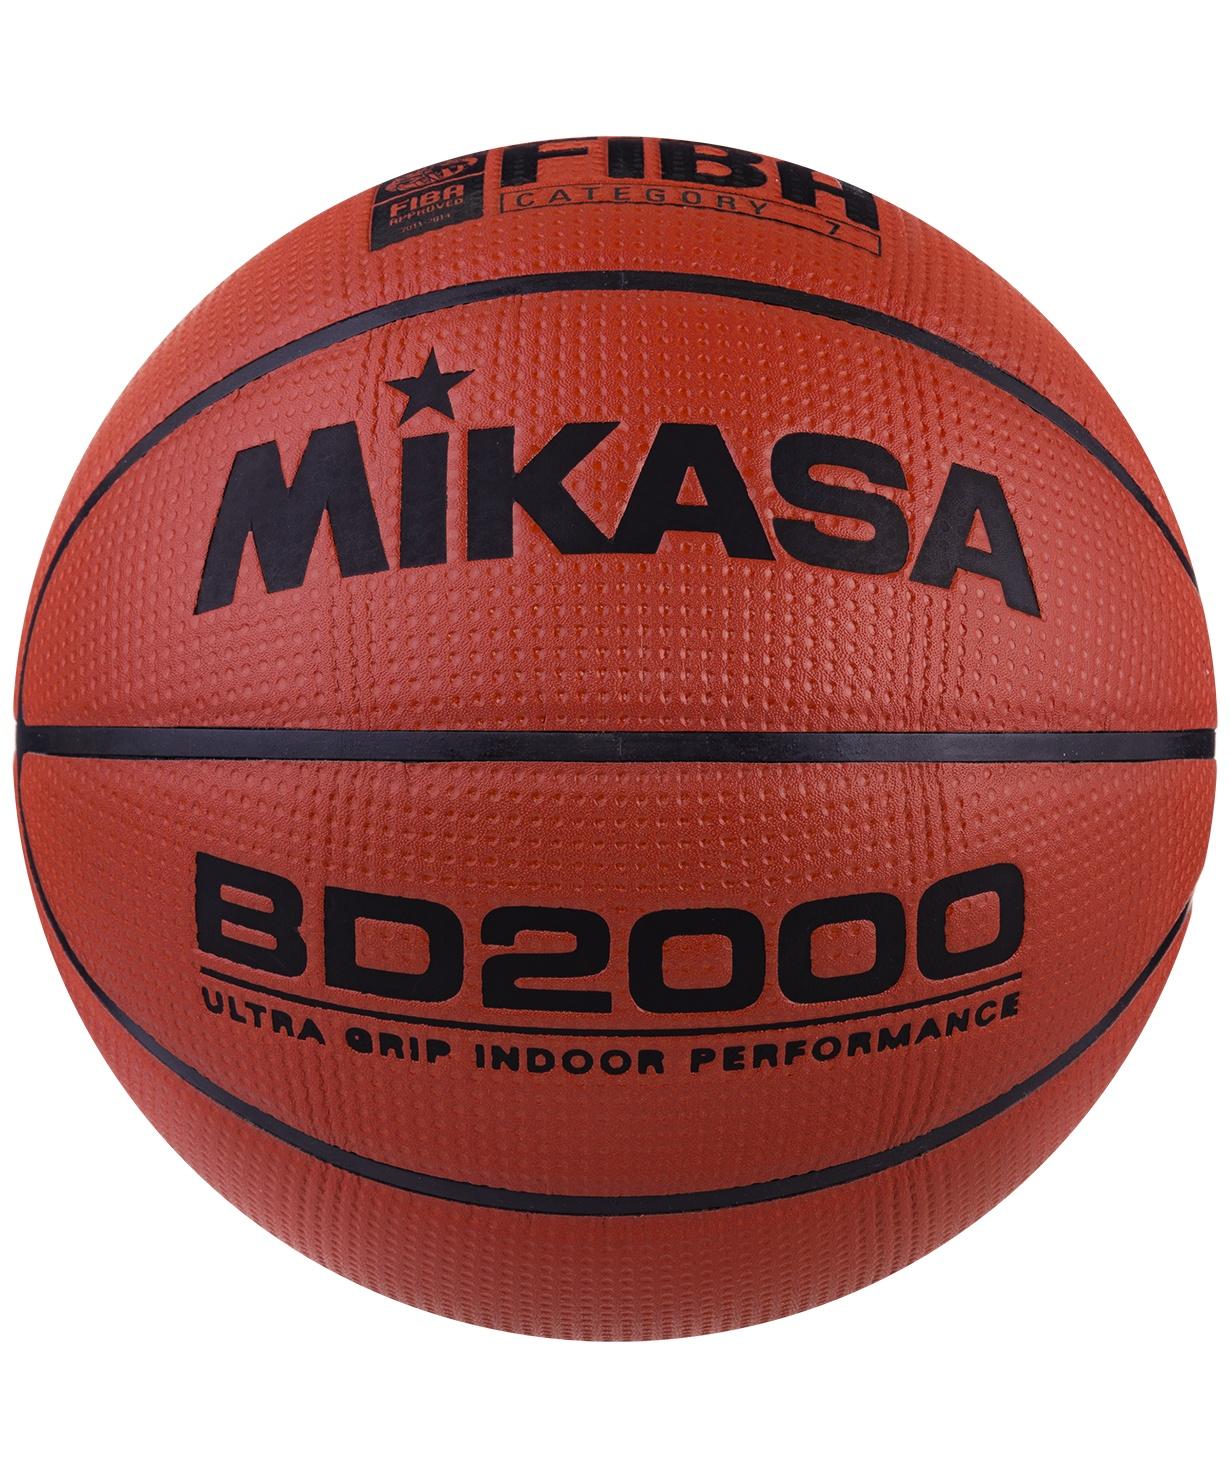 Мяч баскетбольный Mikasa BD 2000, Размер 7 мяч баскетбольный mikasa 1020 р 7 8 панелей